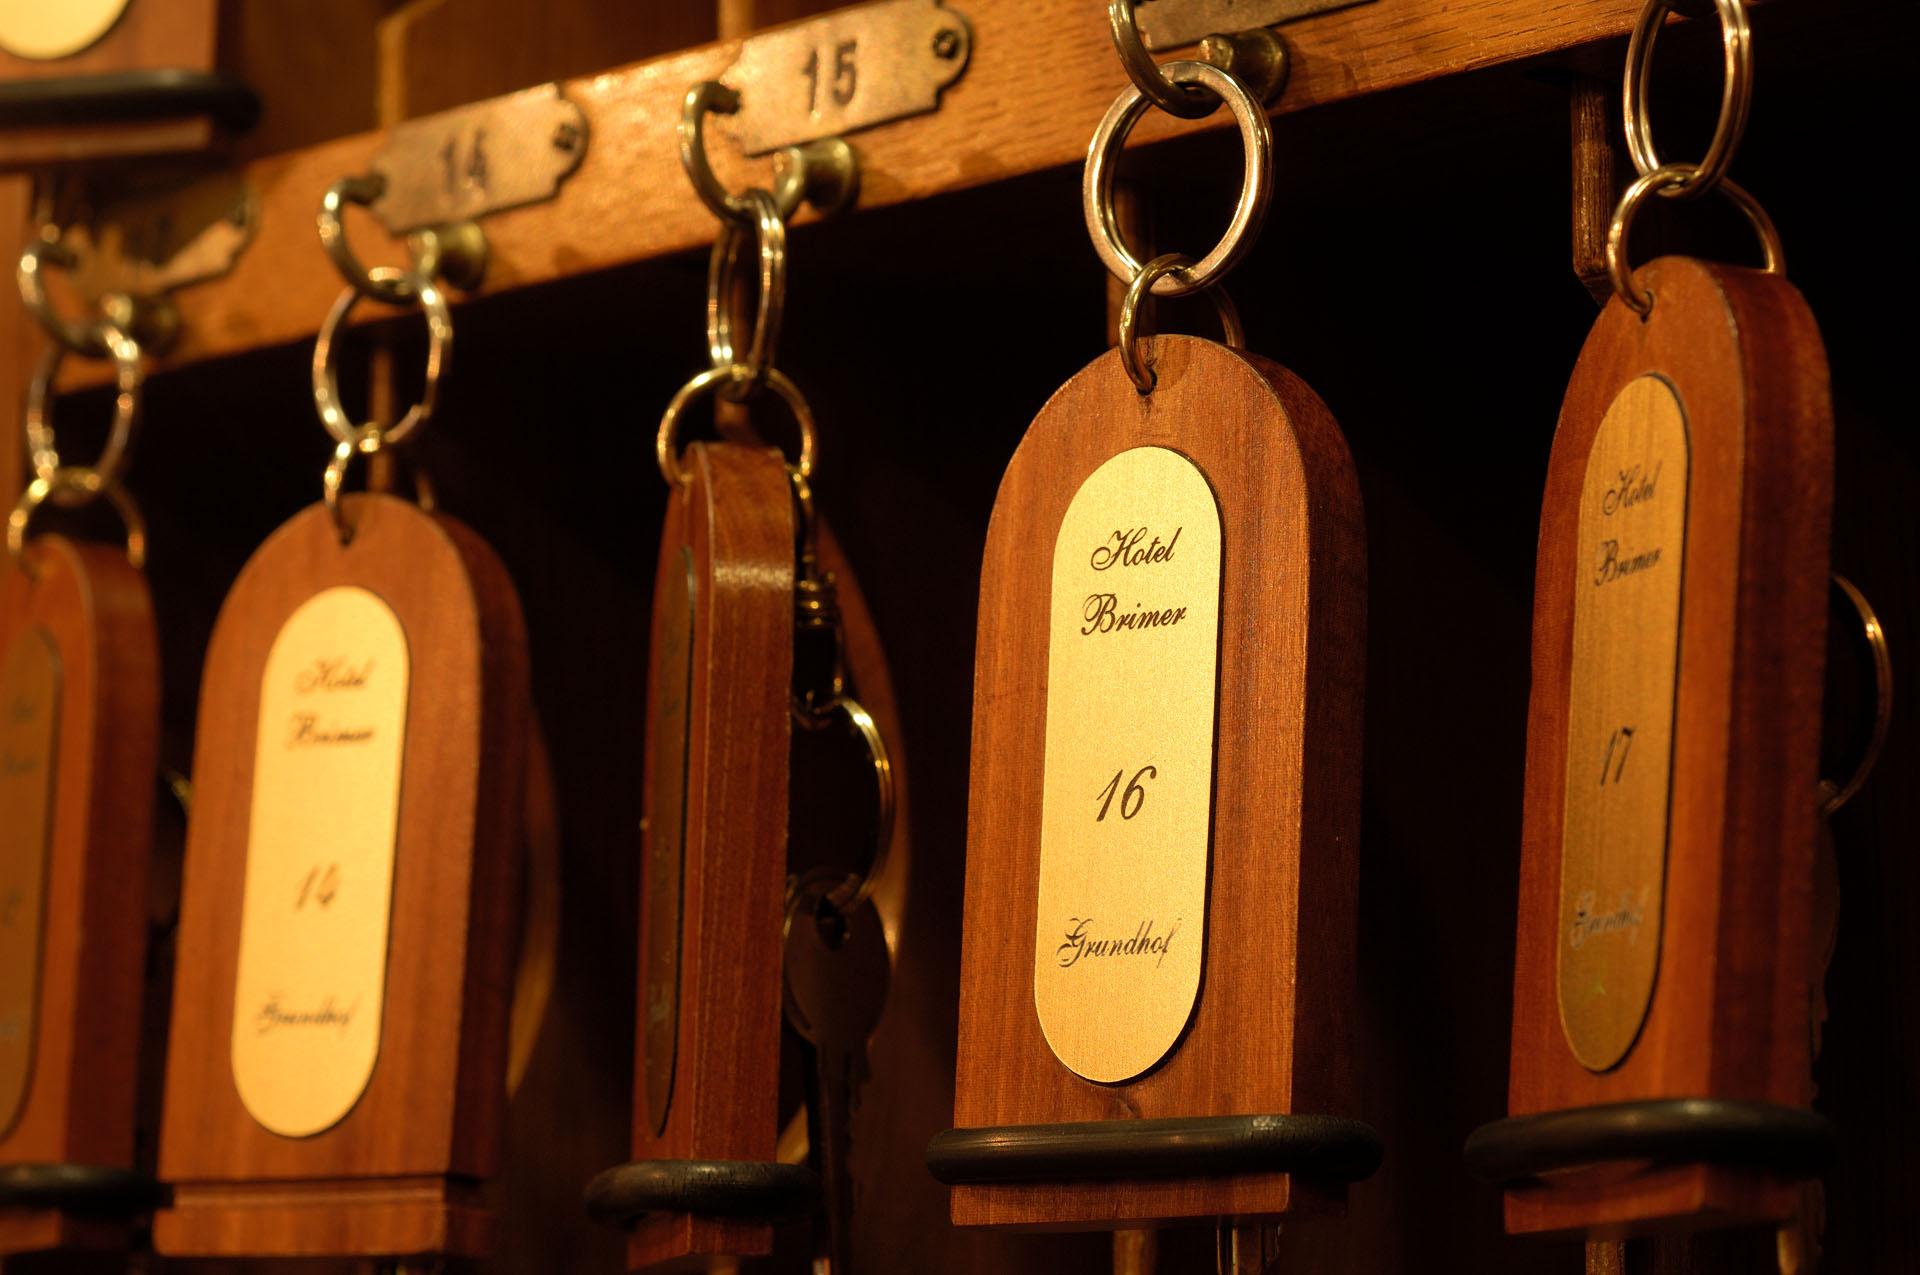 Informations pratiques - Hotel Brimer